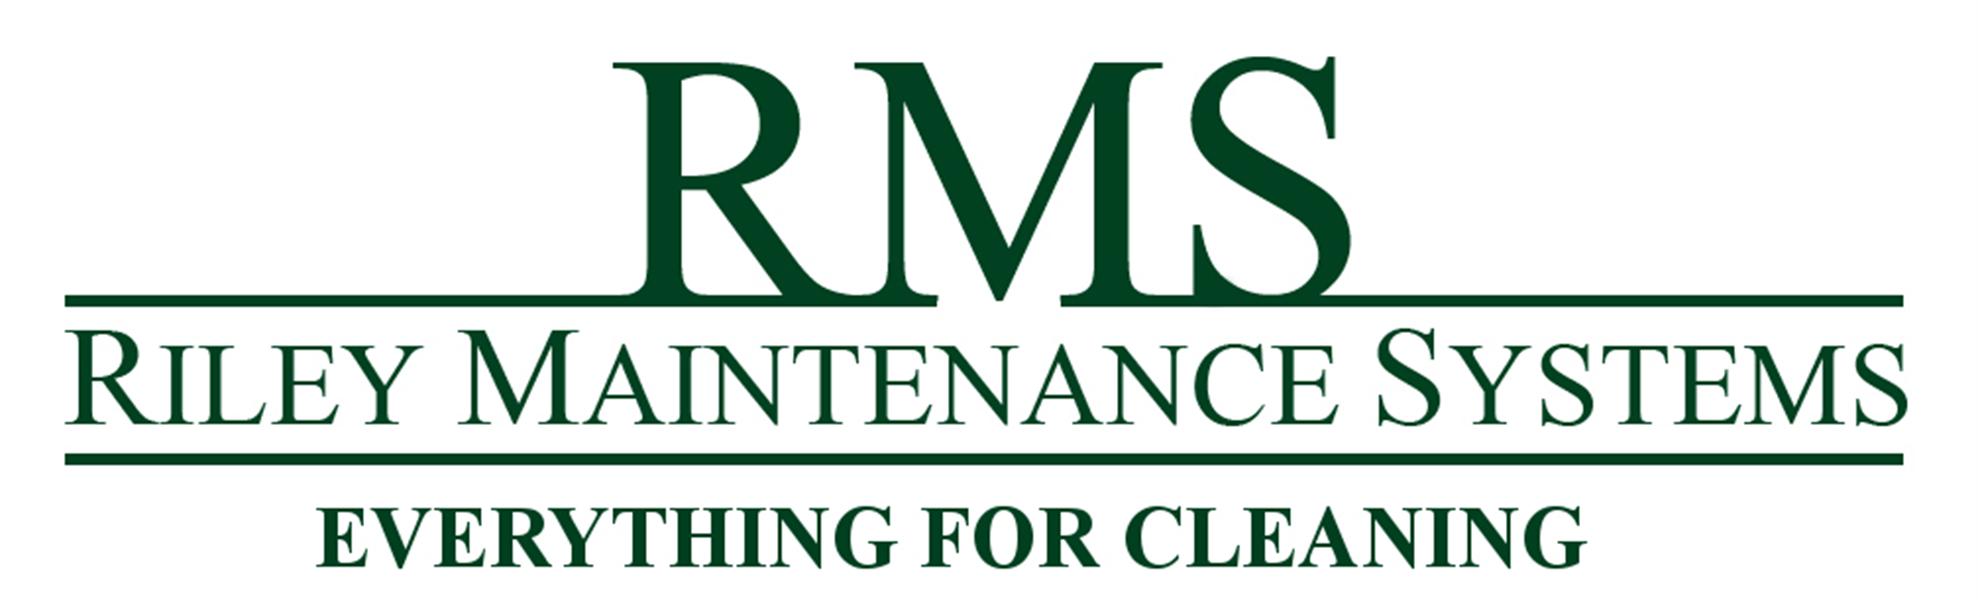 Riley Maintenance Systems, Inc.